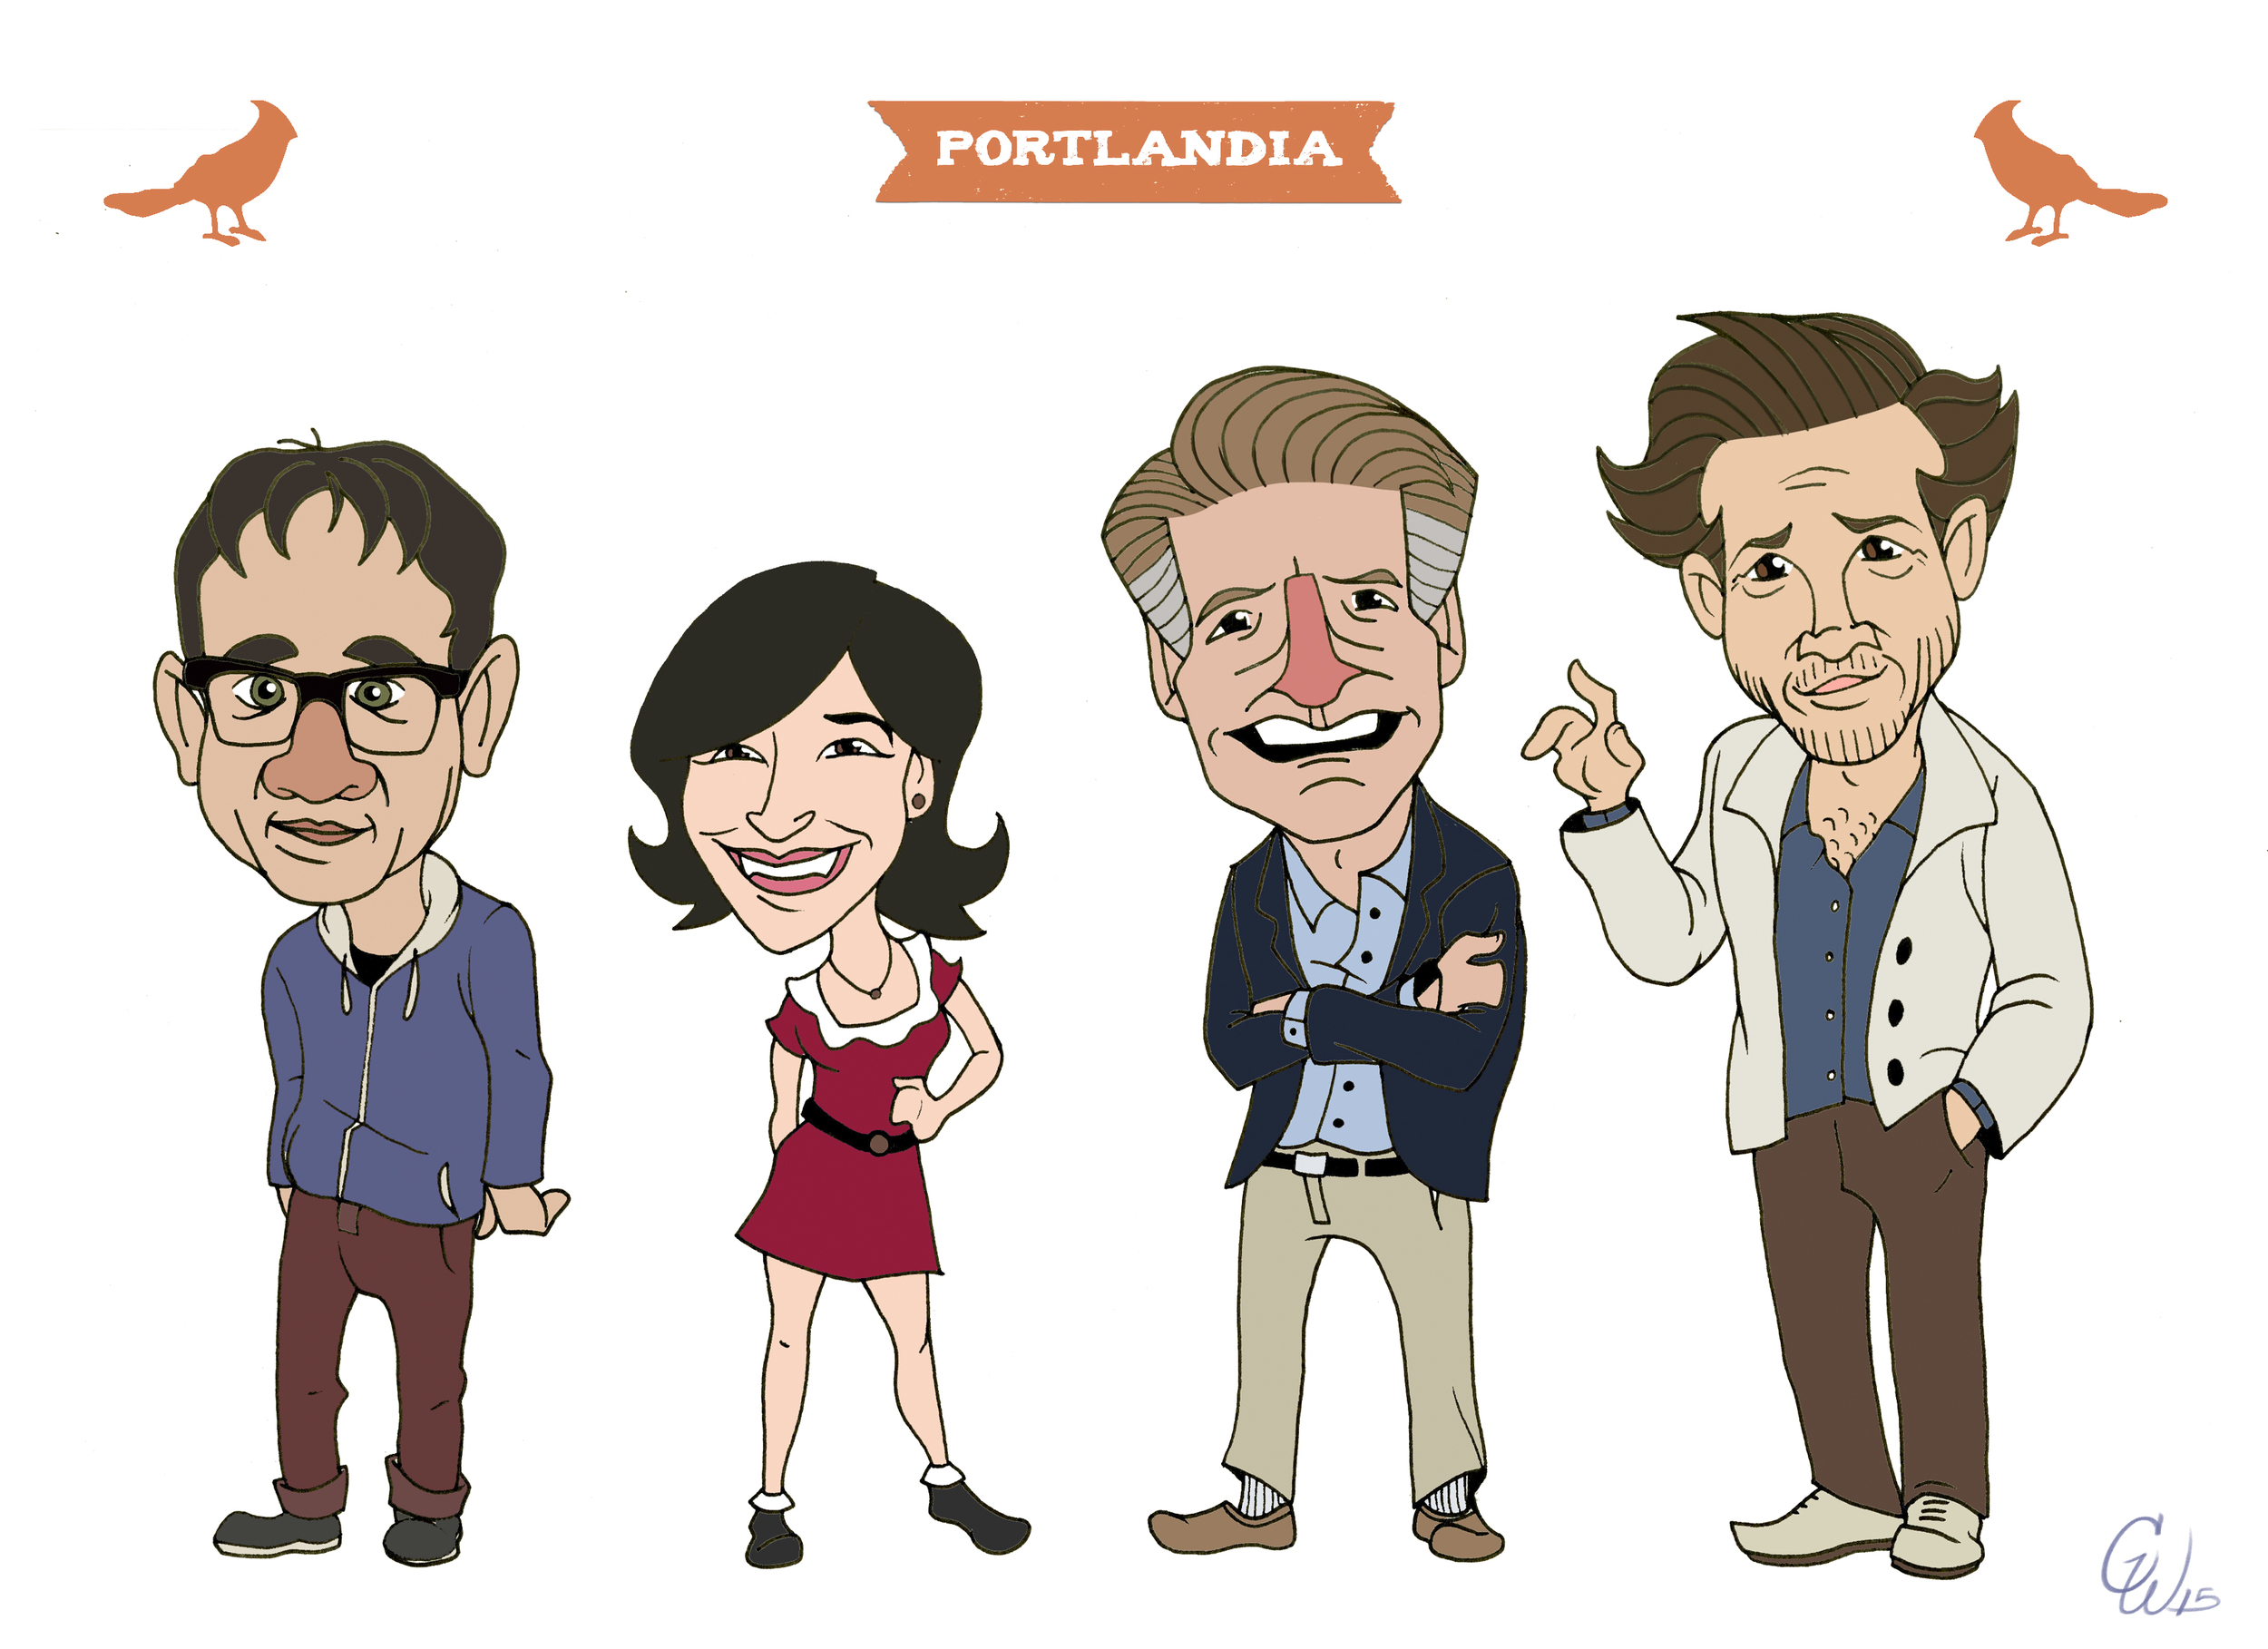 PortlandiaPoster02.jpg